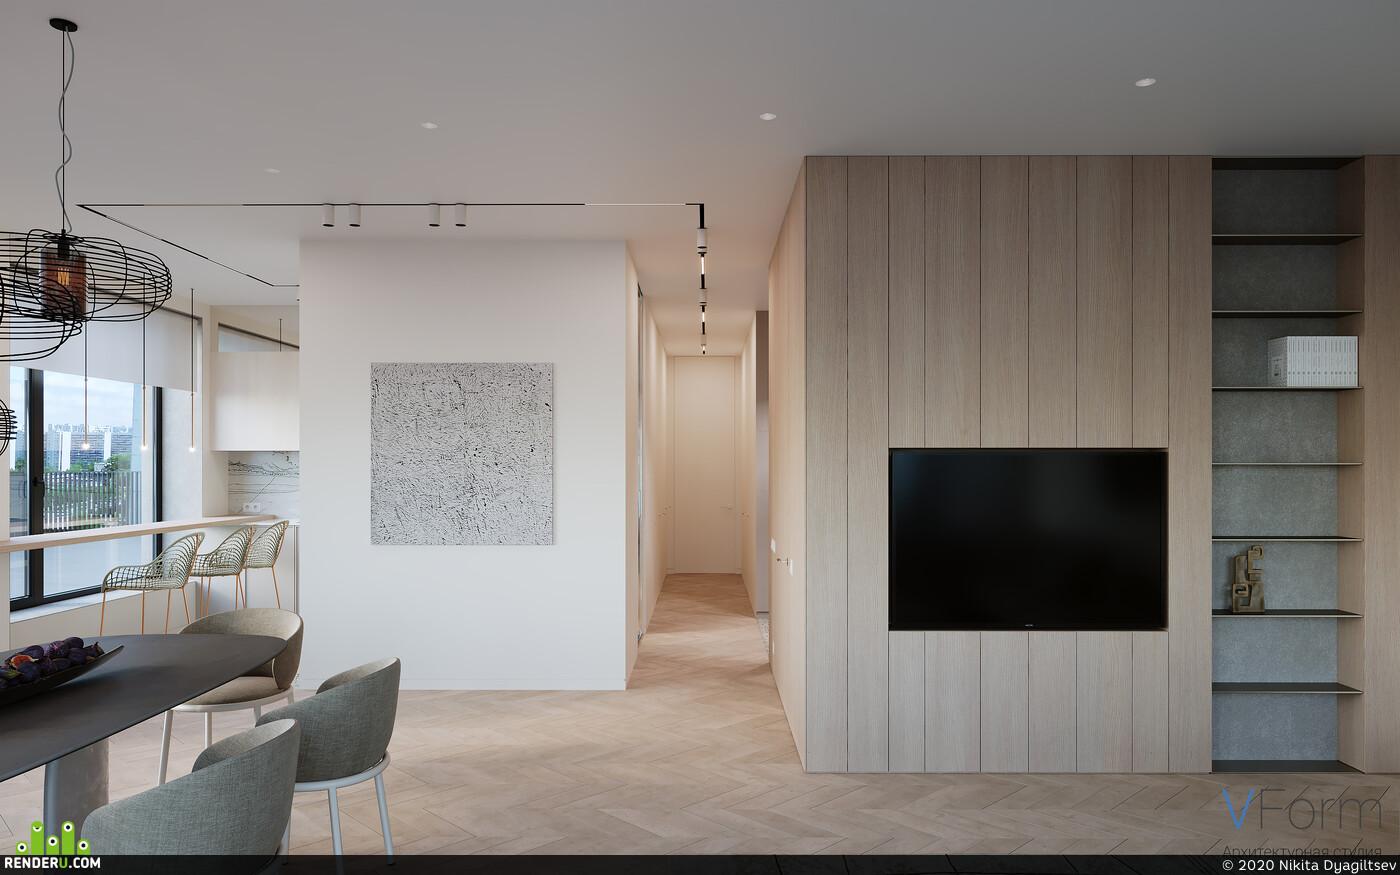 coronarenderer, corona render, corona, Living room interior, interior living room, living, kitchen-living room